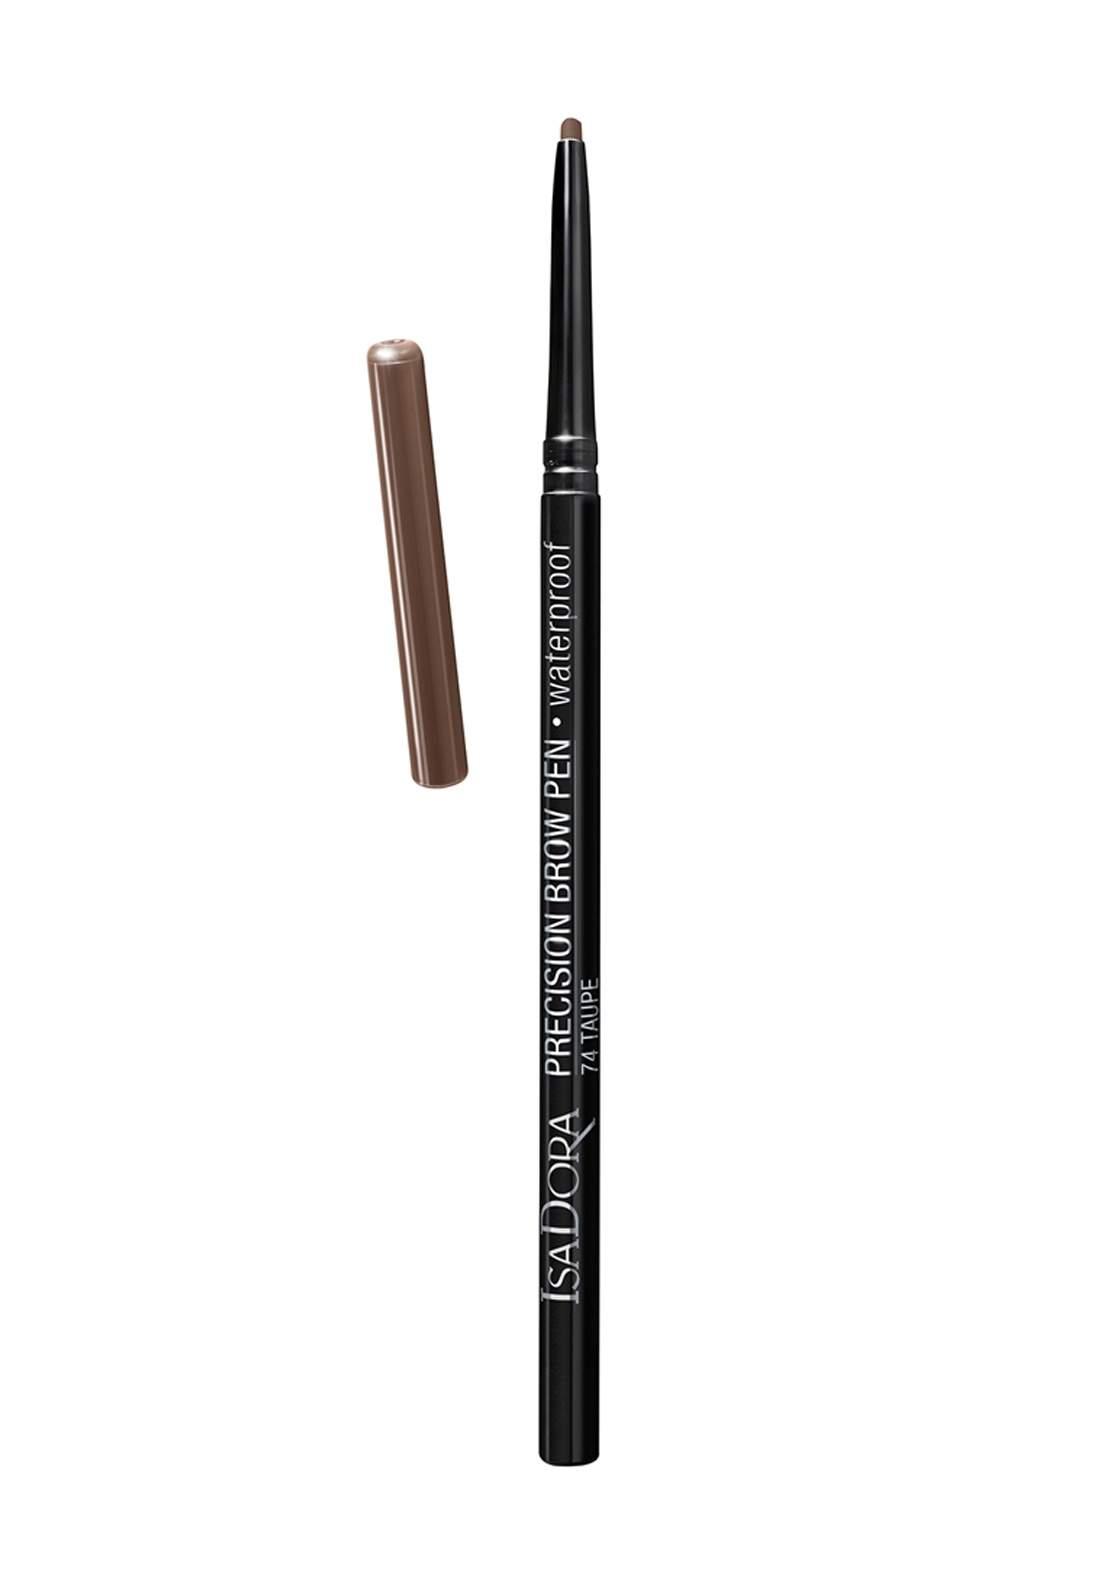 314203 Isadora Precision Brow Pen Wateproof - Taupe قلم حاجب